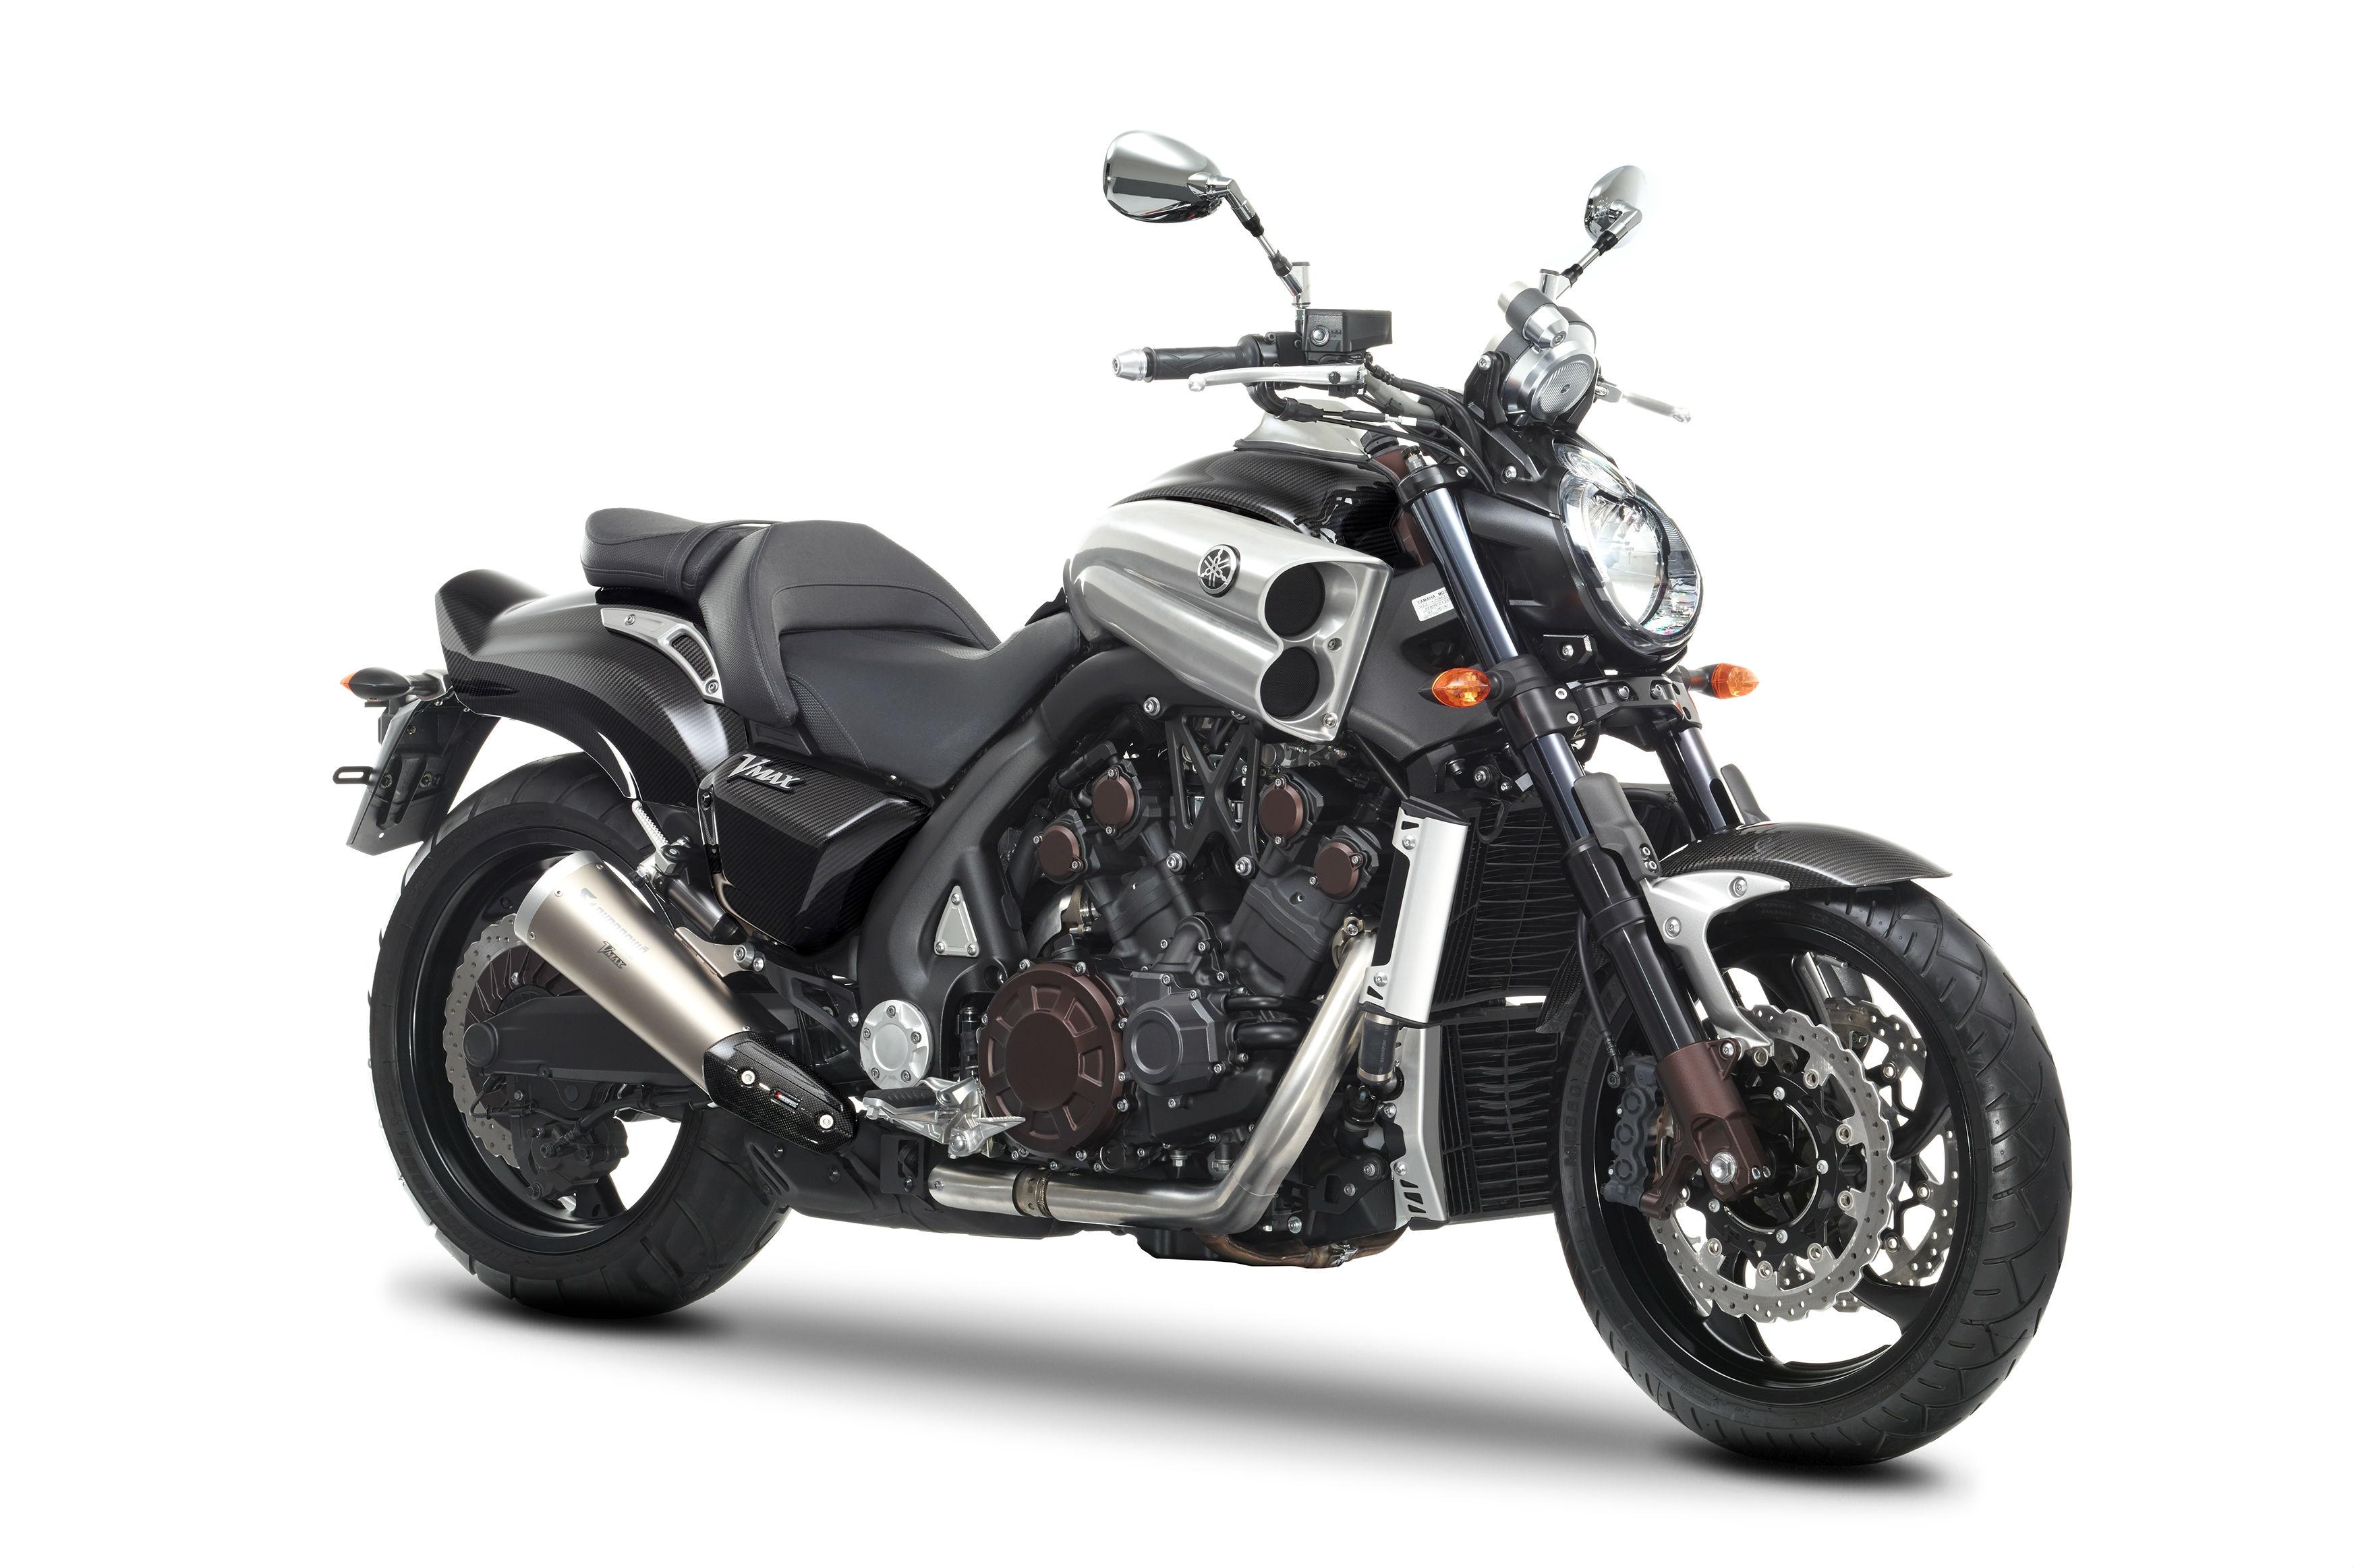 Yamaha reveals special edition VMAX Carbon | Visordown